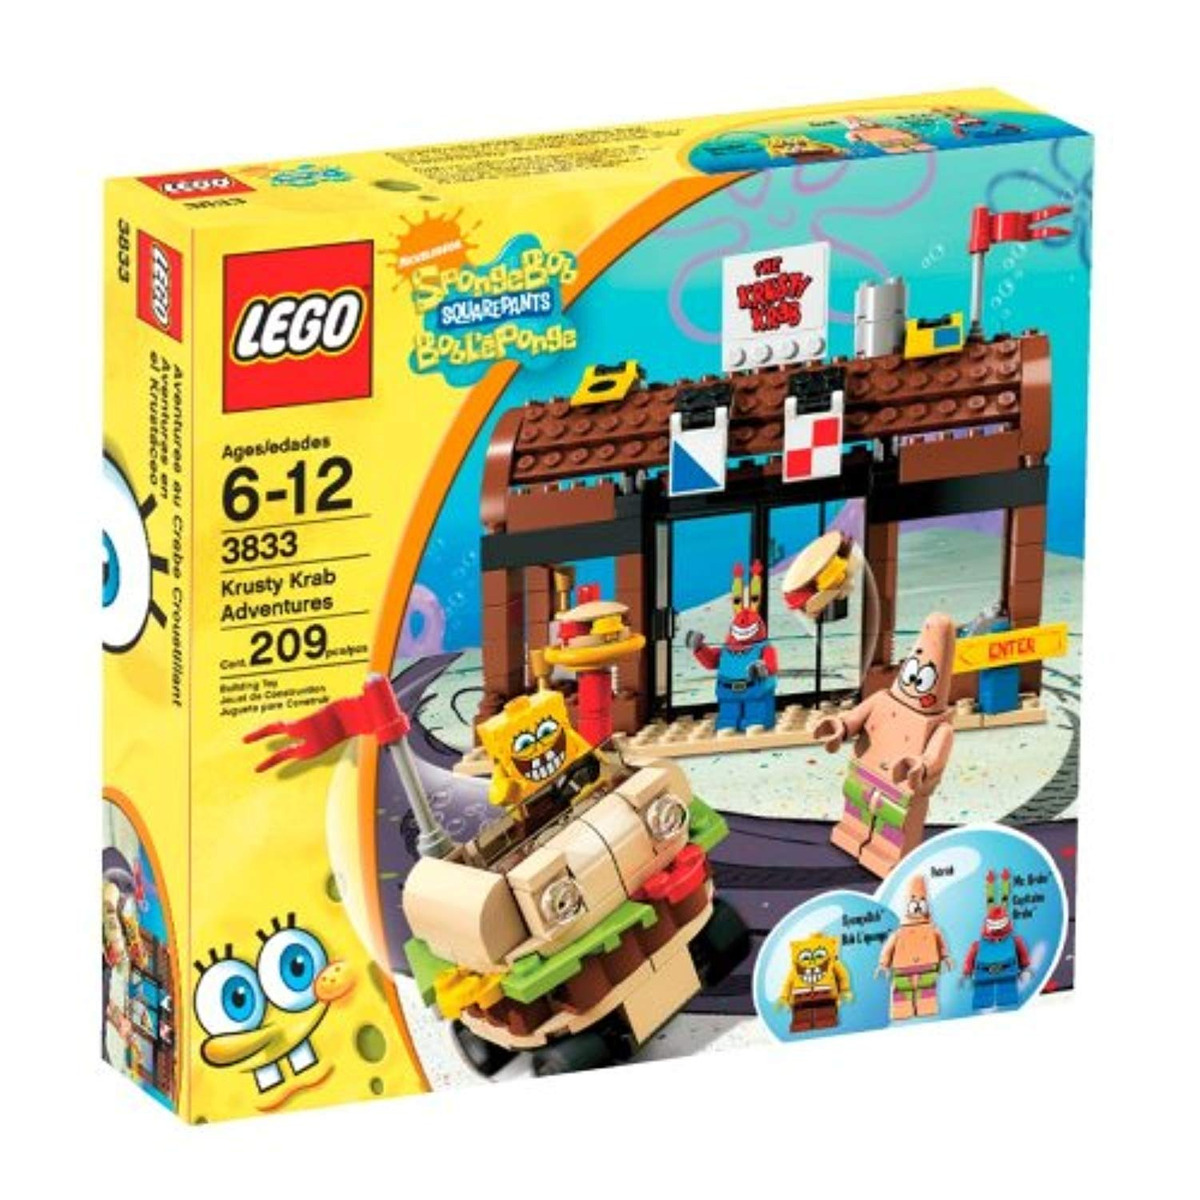 Krab Krusty Squarepants Spongebob Lego Adventures wPn0k8O